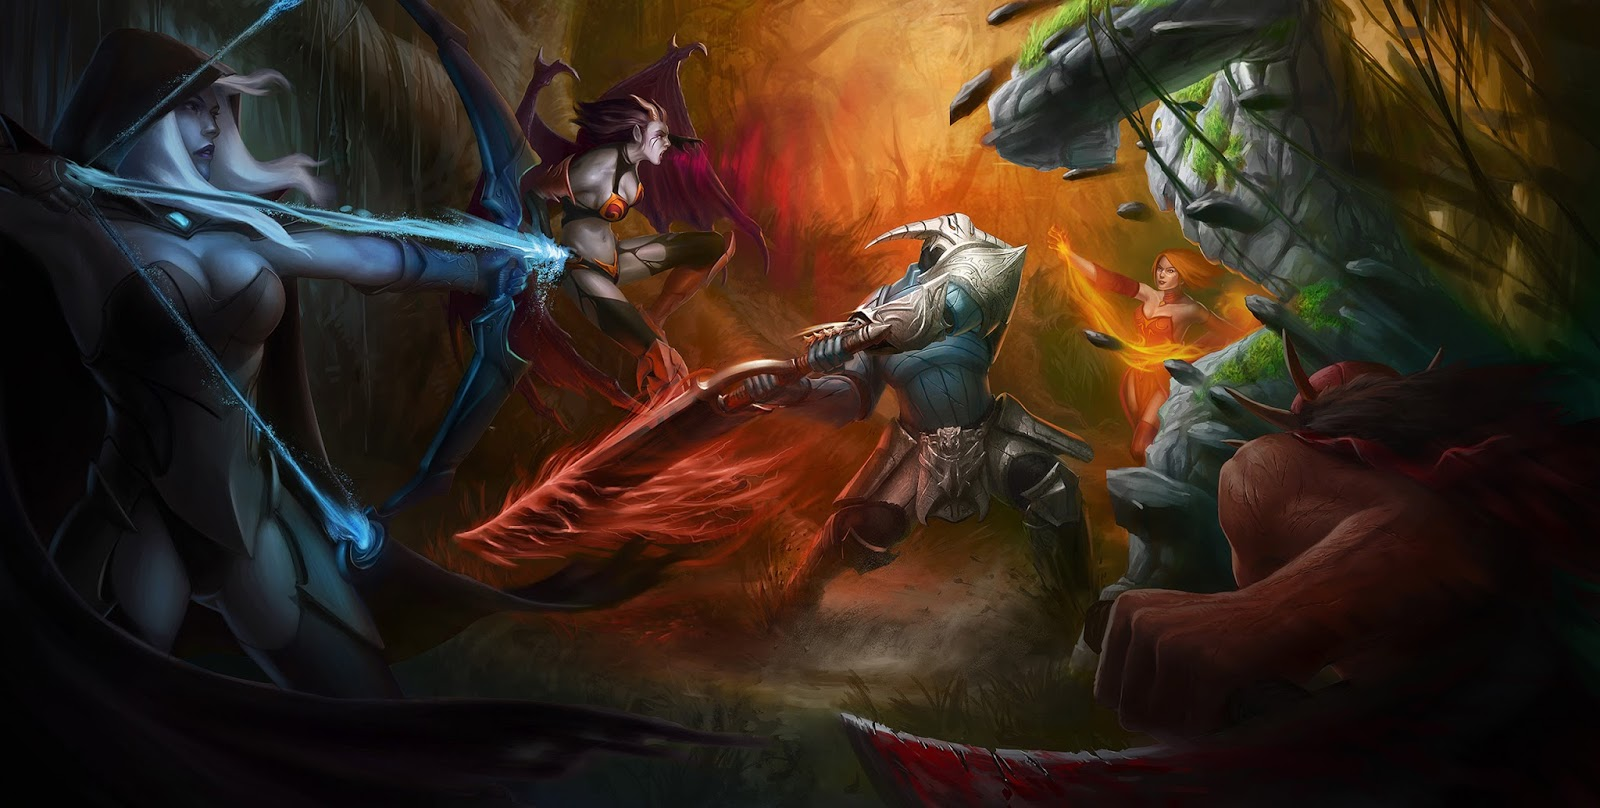 Drow Ranger Bloodseeker Sven Tiny Lina Inverse Queen Of Pain DOTA 2